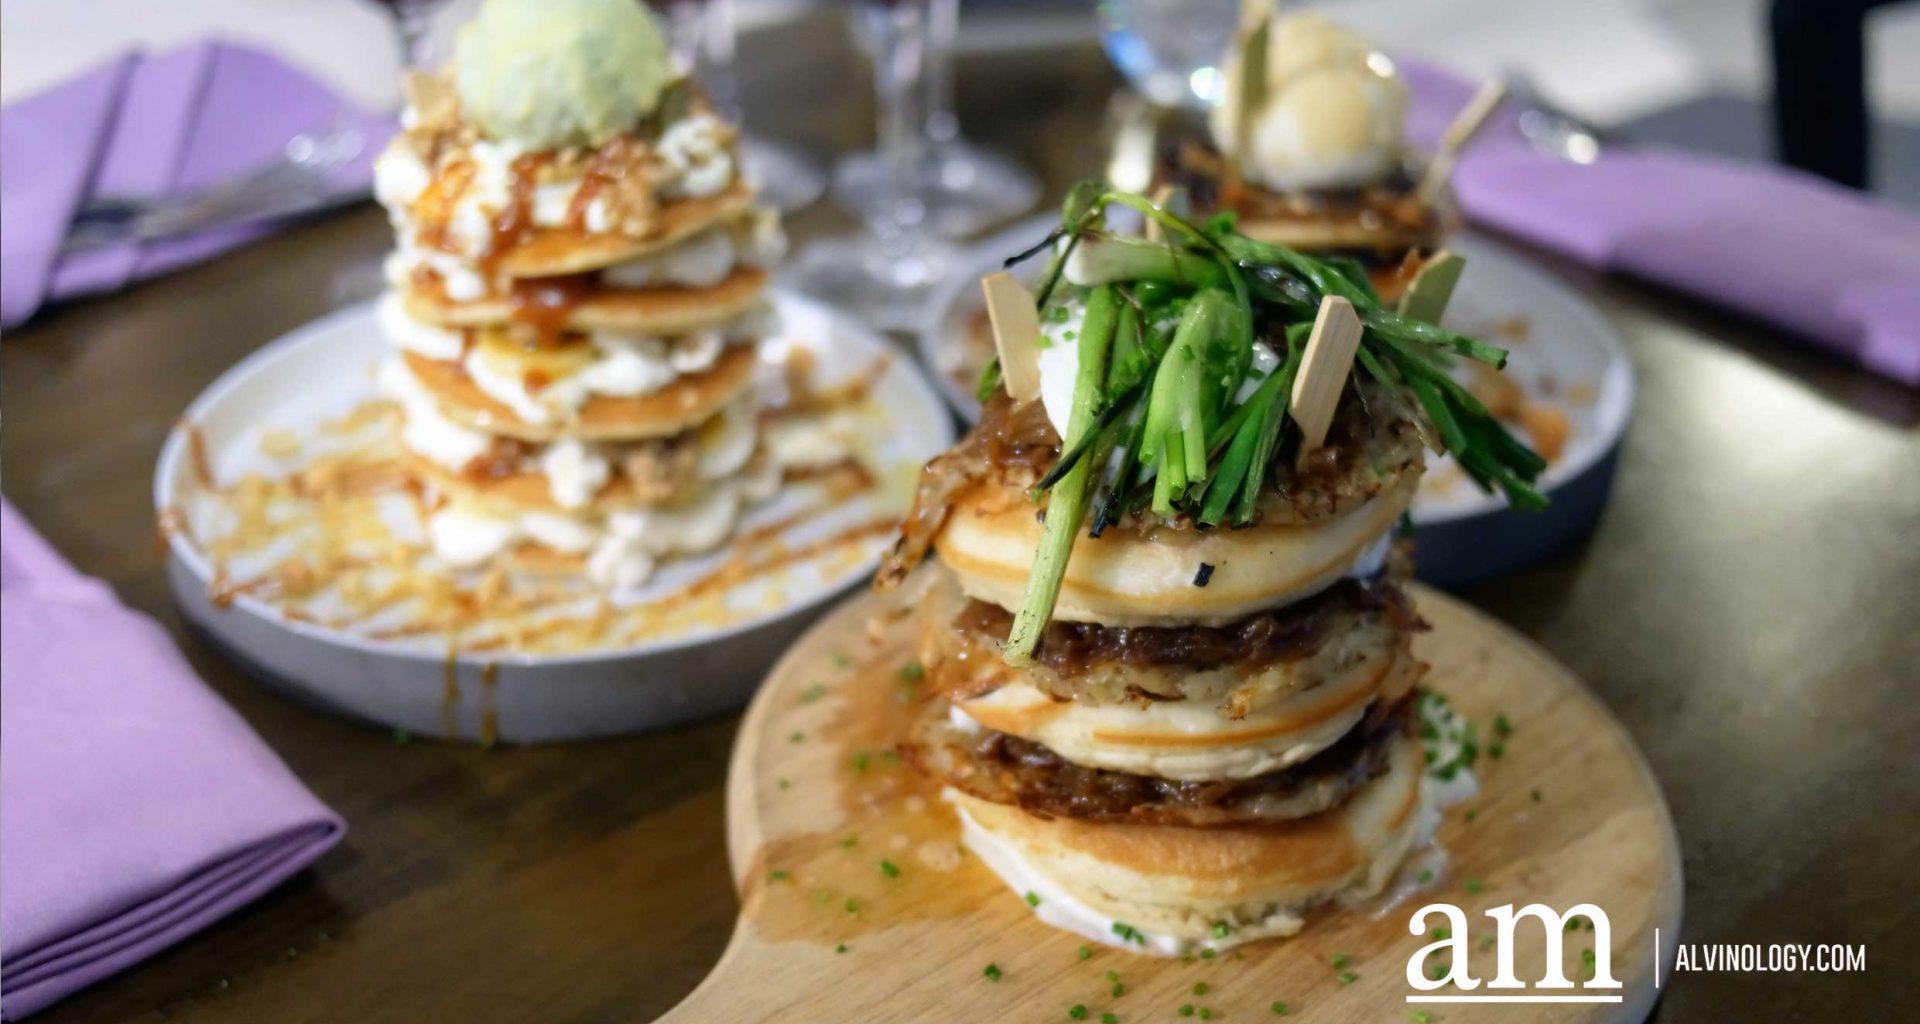 [Review] So/Sofitel Flippin' Sunday Brunch: Pancakes Sweet, Savoury and Boozy! - Alvinology